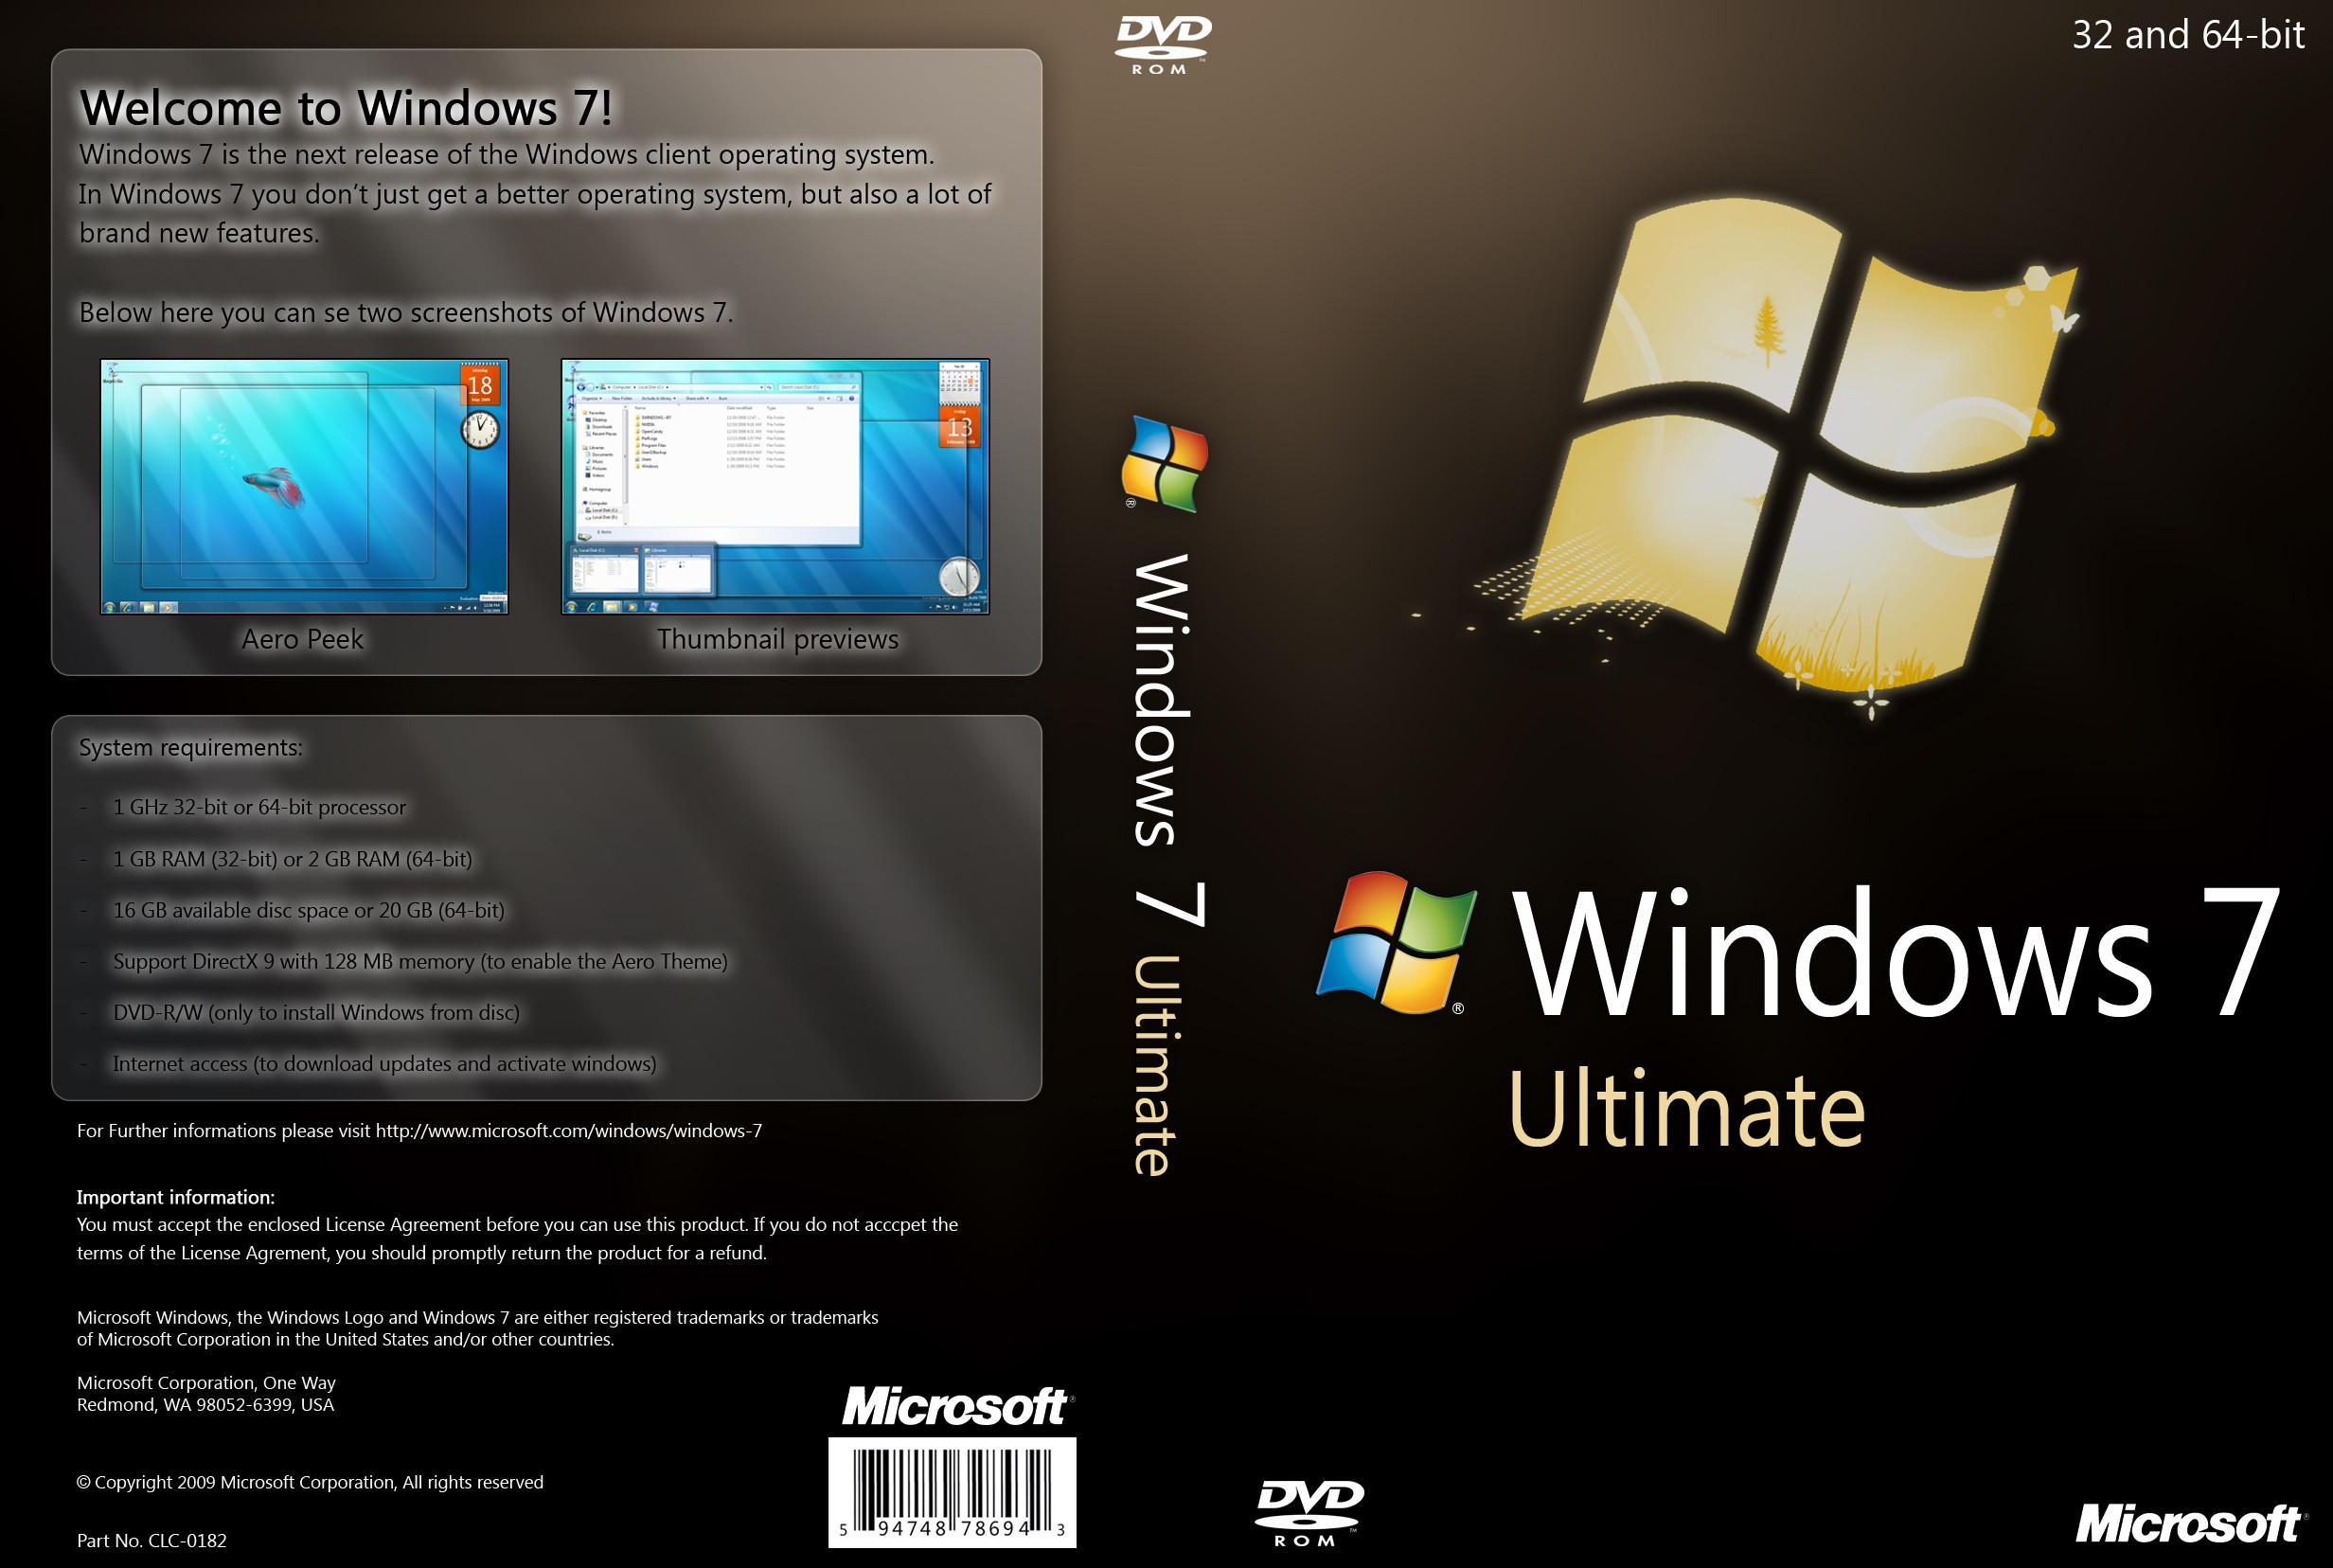 windows 7 ultimate dvd by yaxxe on deviantart. Black Bedroom Furniture Sets. Home Design Ideas